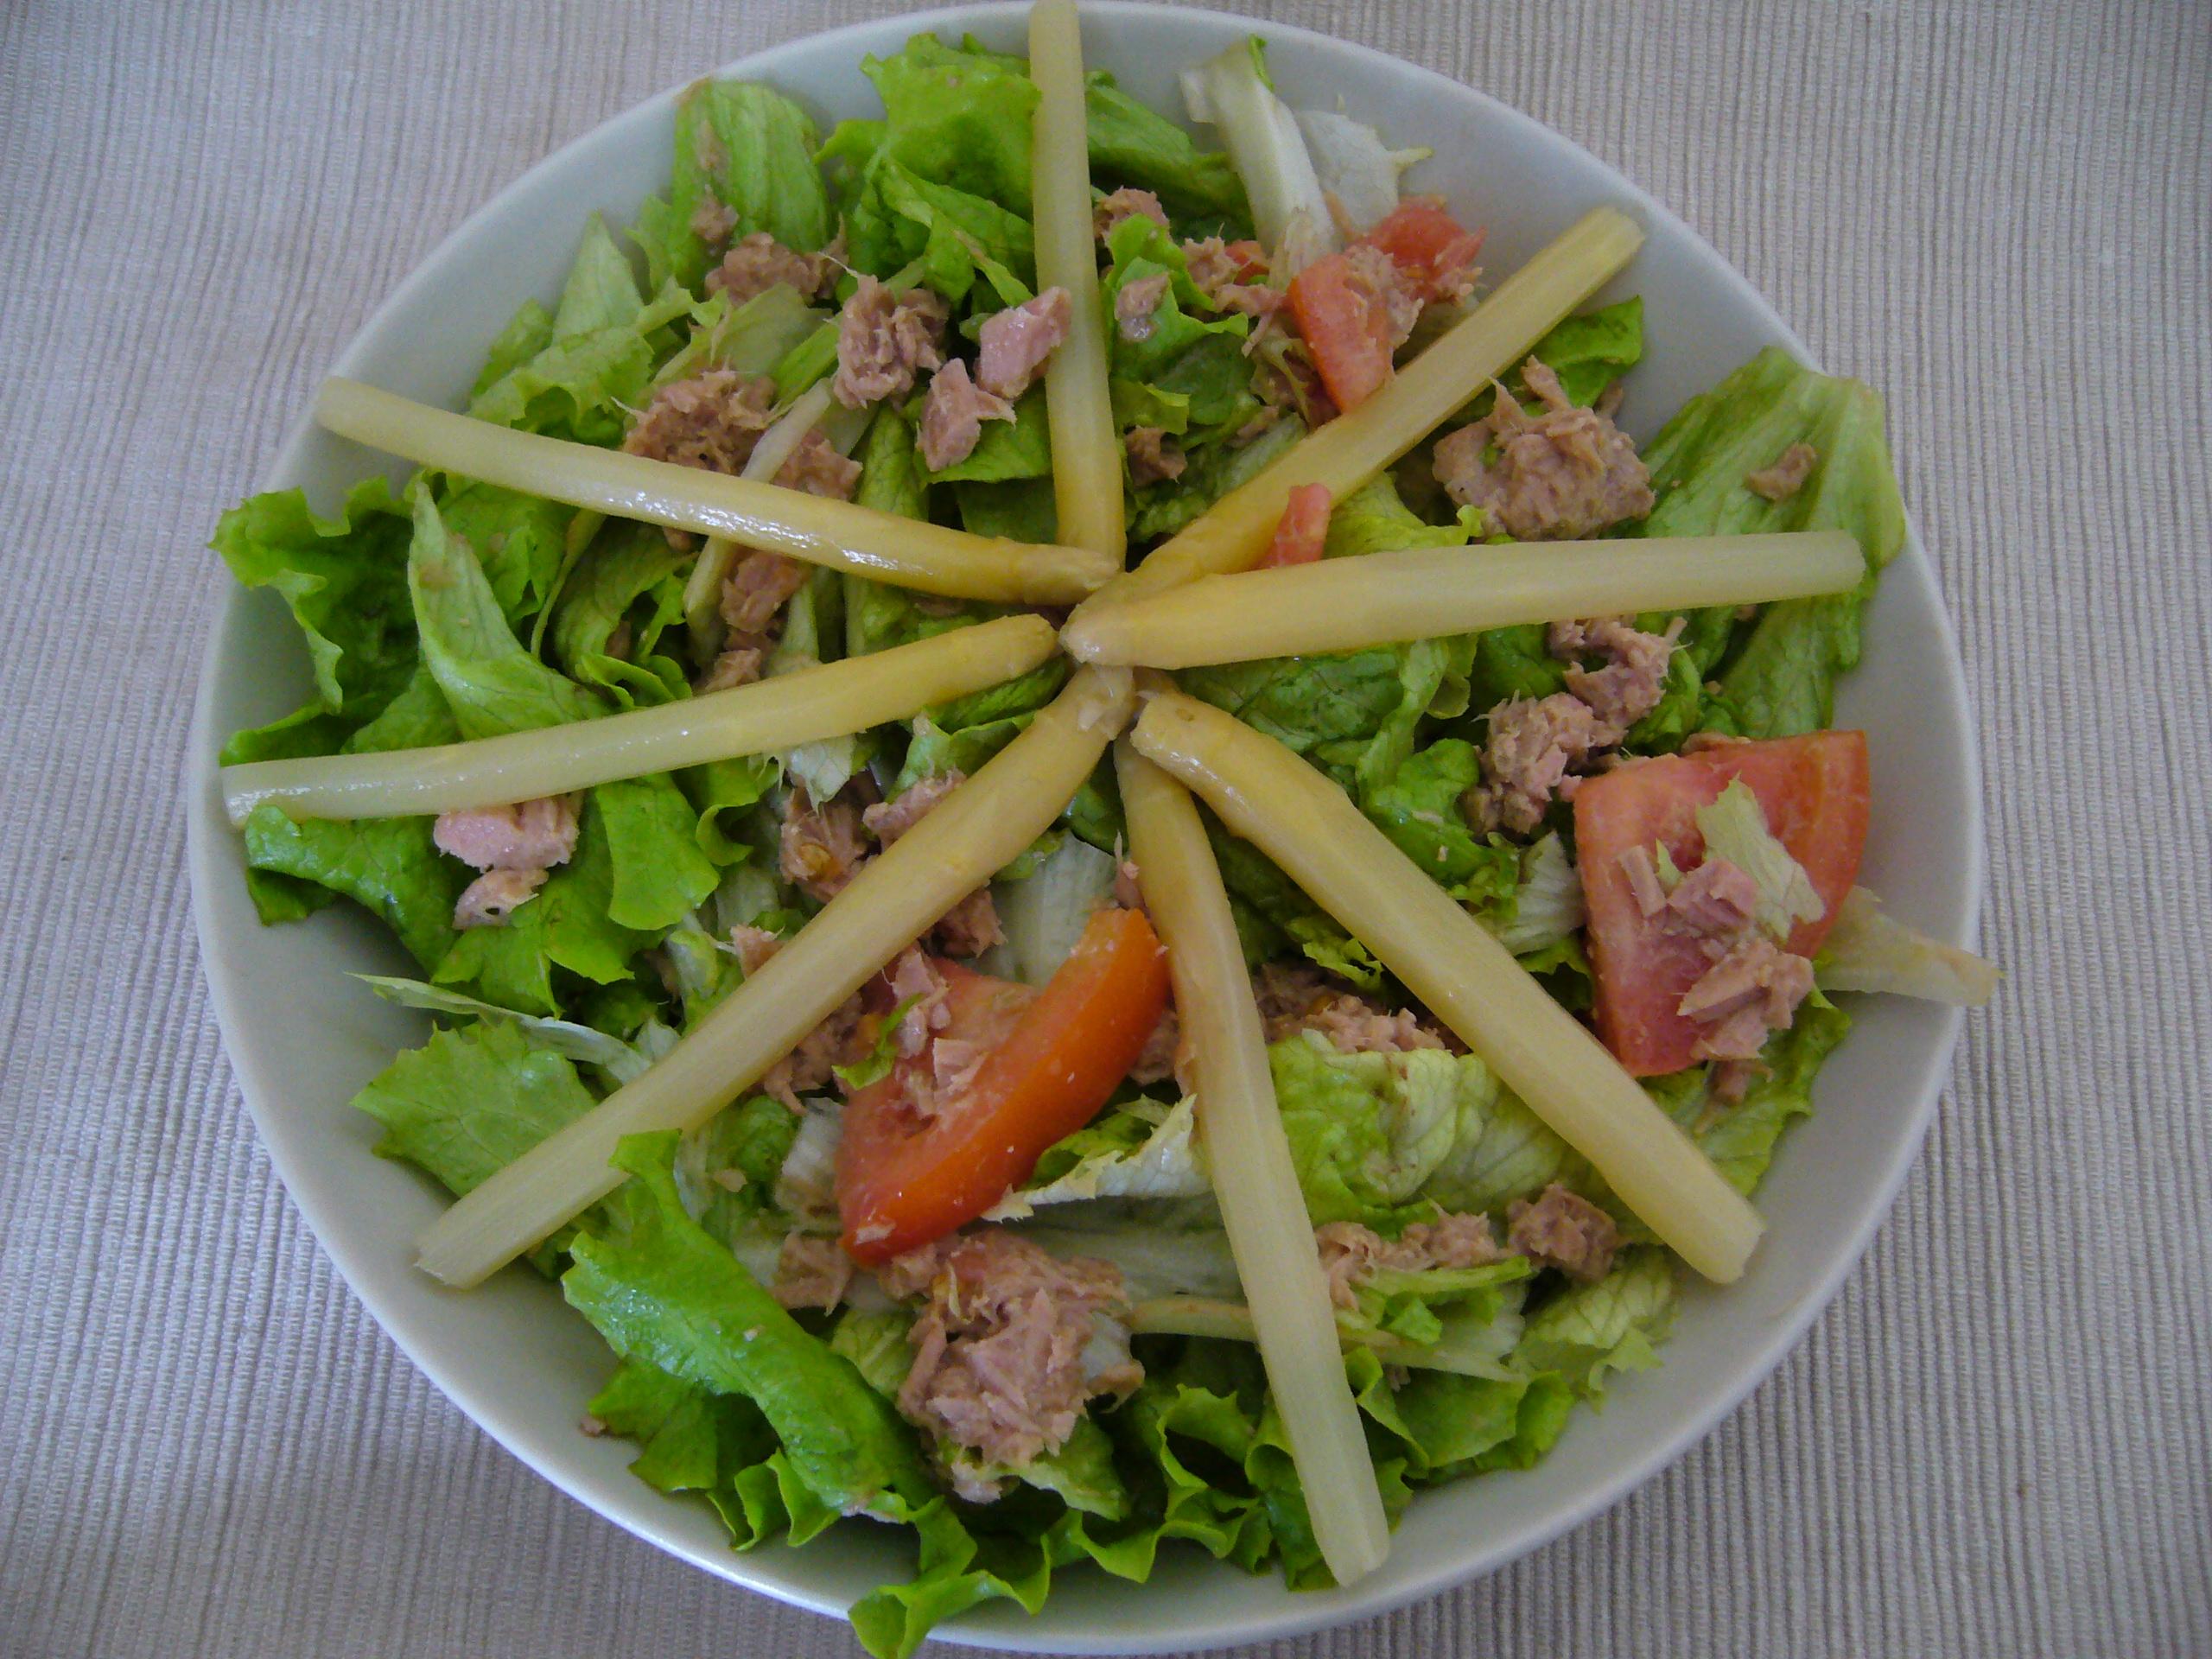 salade de thon et asperges recettes dukan. Black Bedroom Furniture Sets. Home Design Ideas